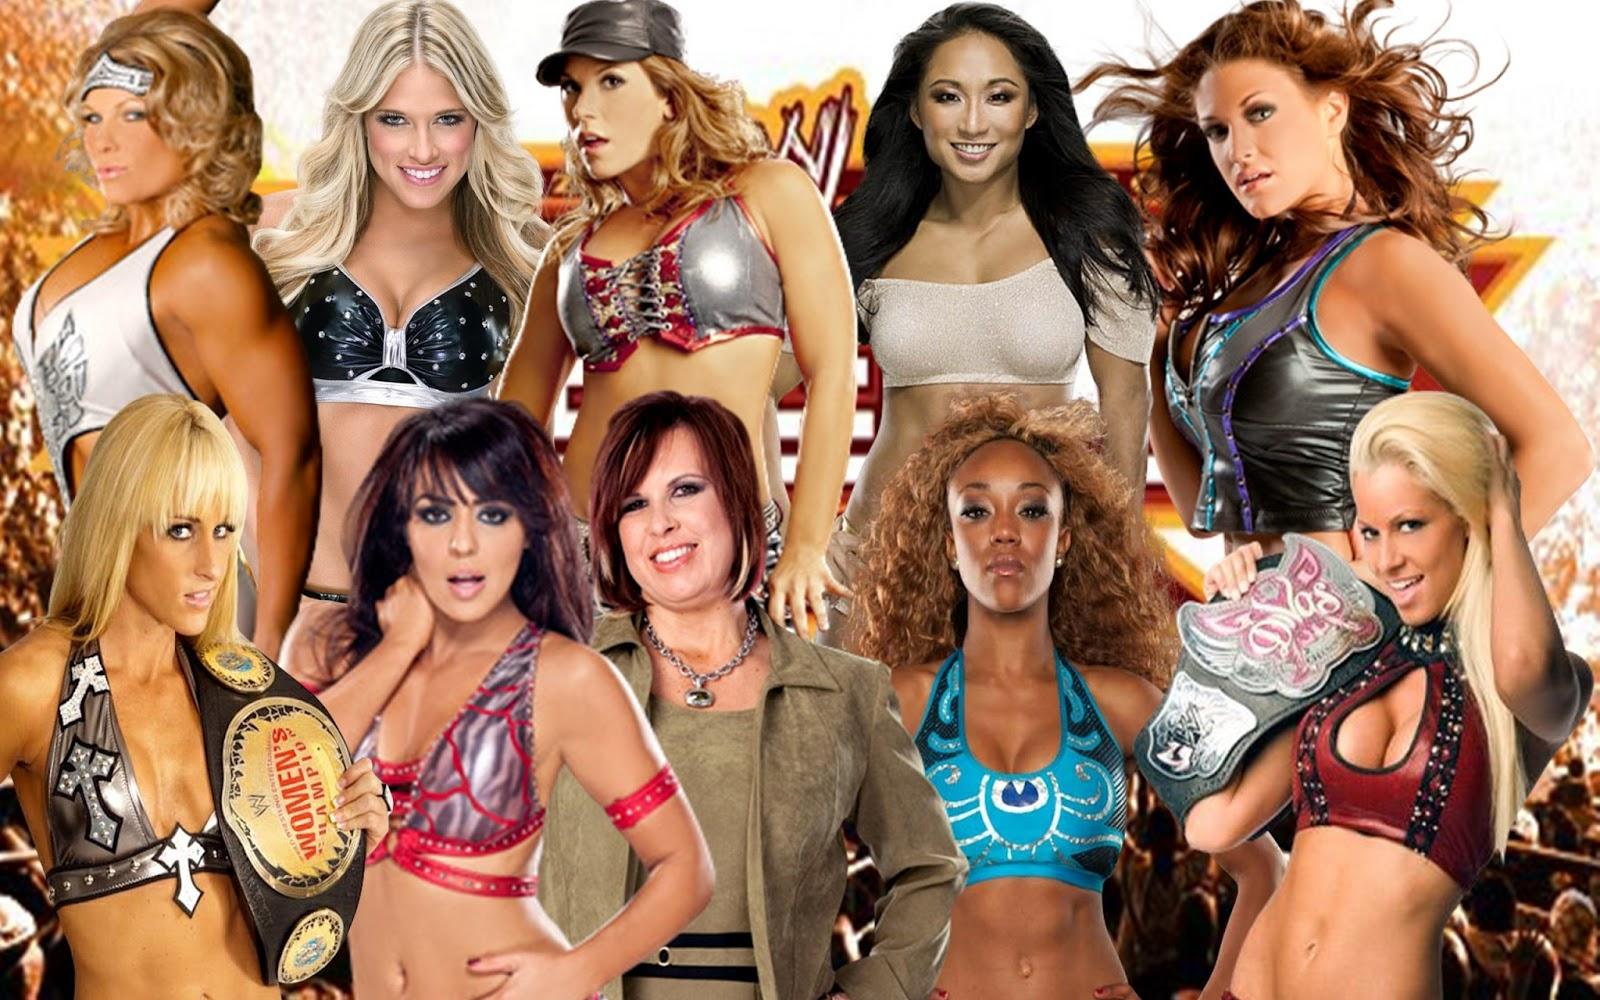 Wwe Layla And Jey Uso Wwe championship